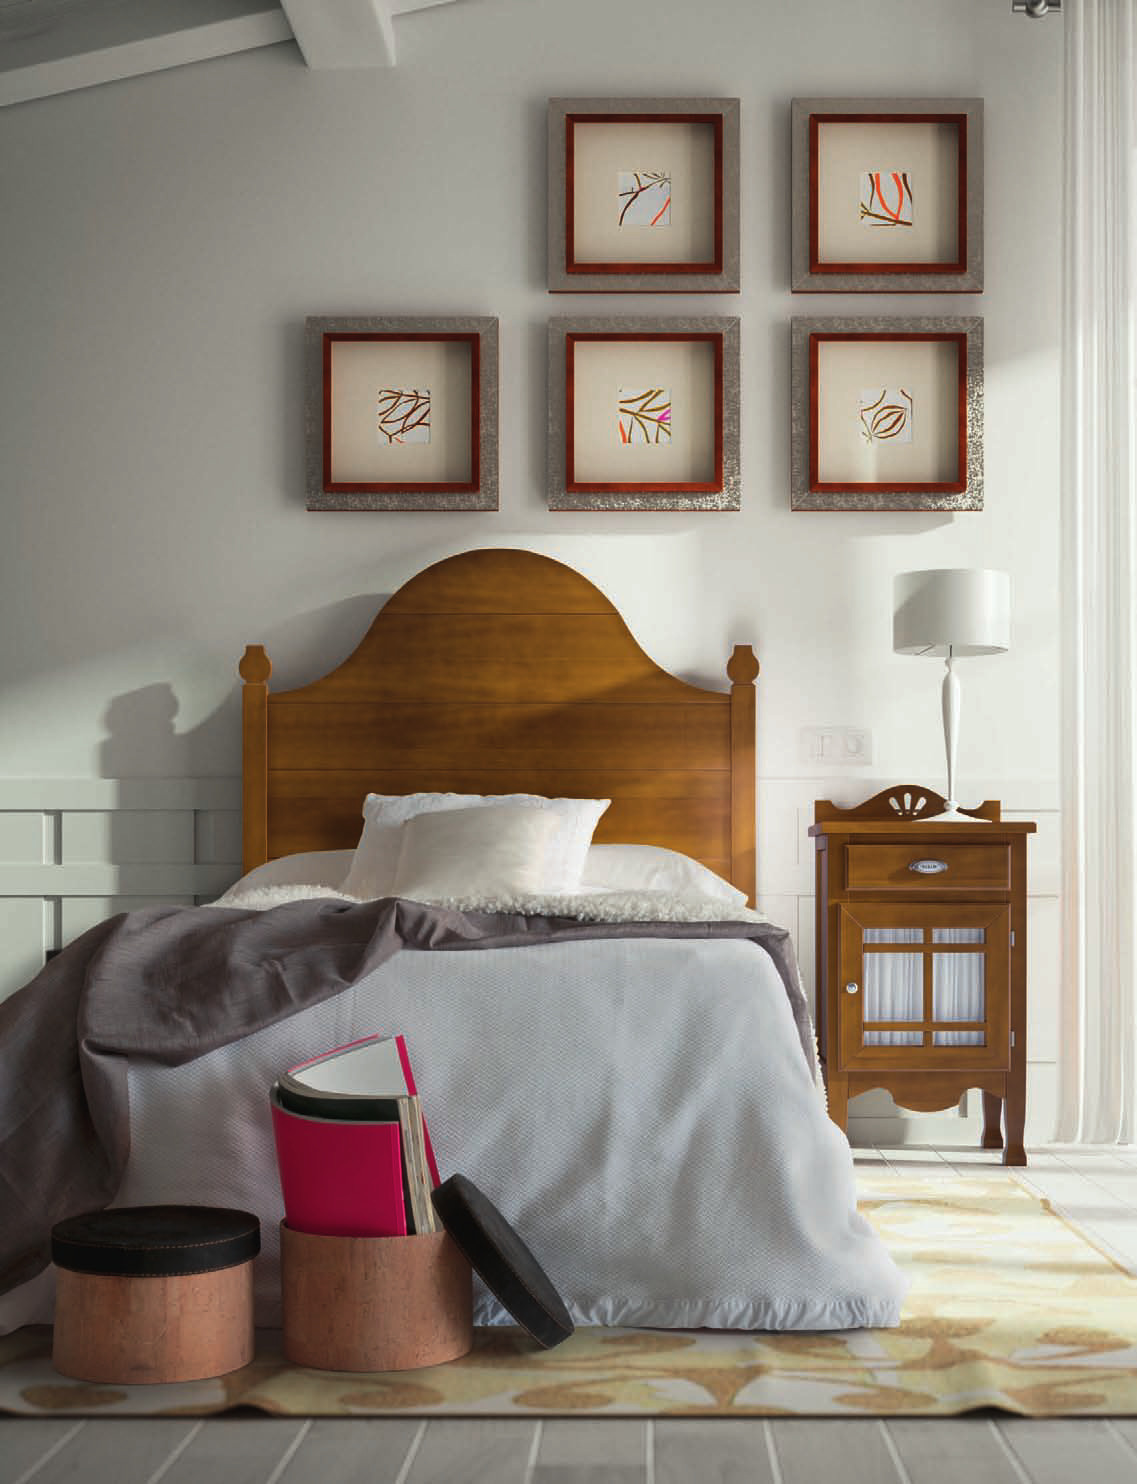 416-dormitorio-j-57